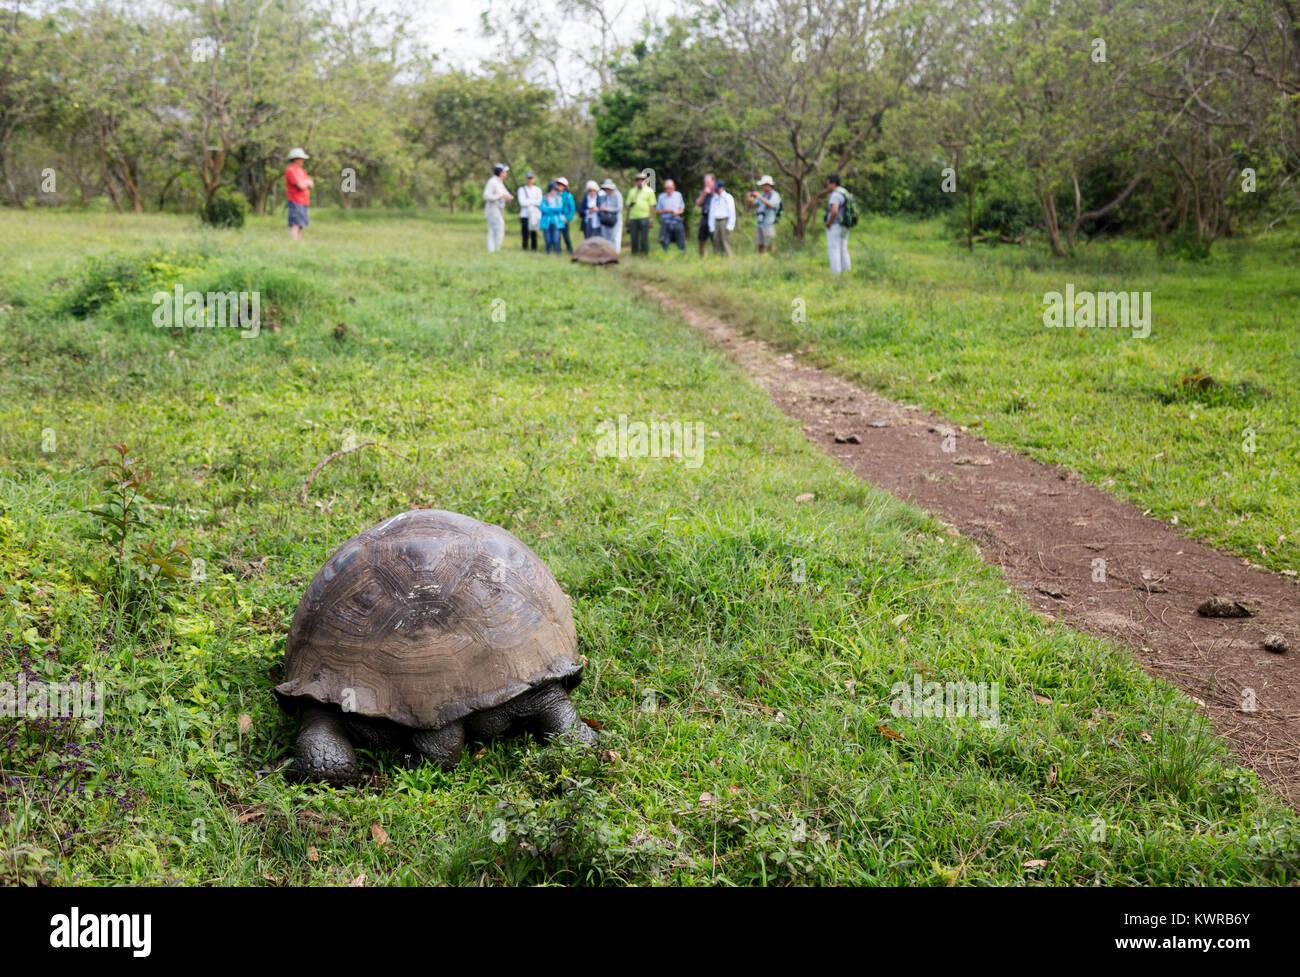 Galapagos giant tortoise ( Chelonoidis Nigra ), and tourists, El Chato Ranch, Santa Cruz island, galapagos Islands, - Stock Image